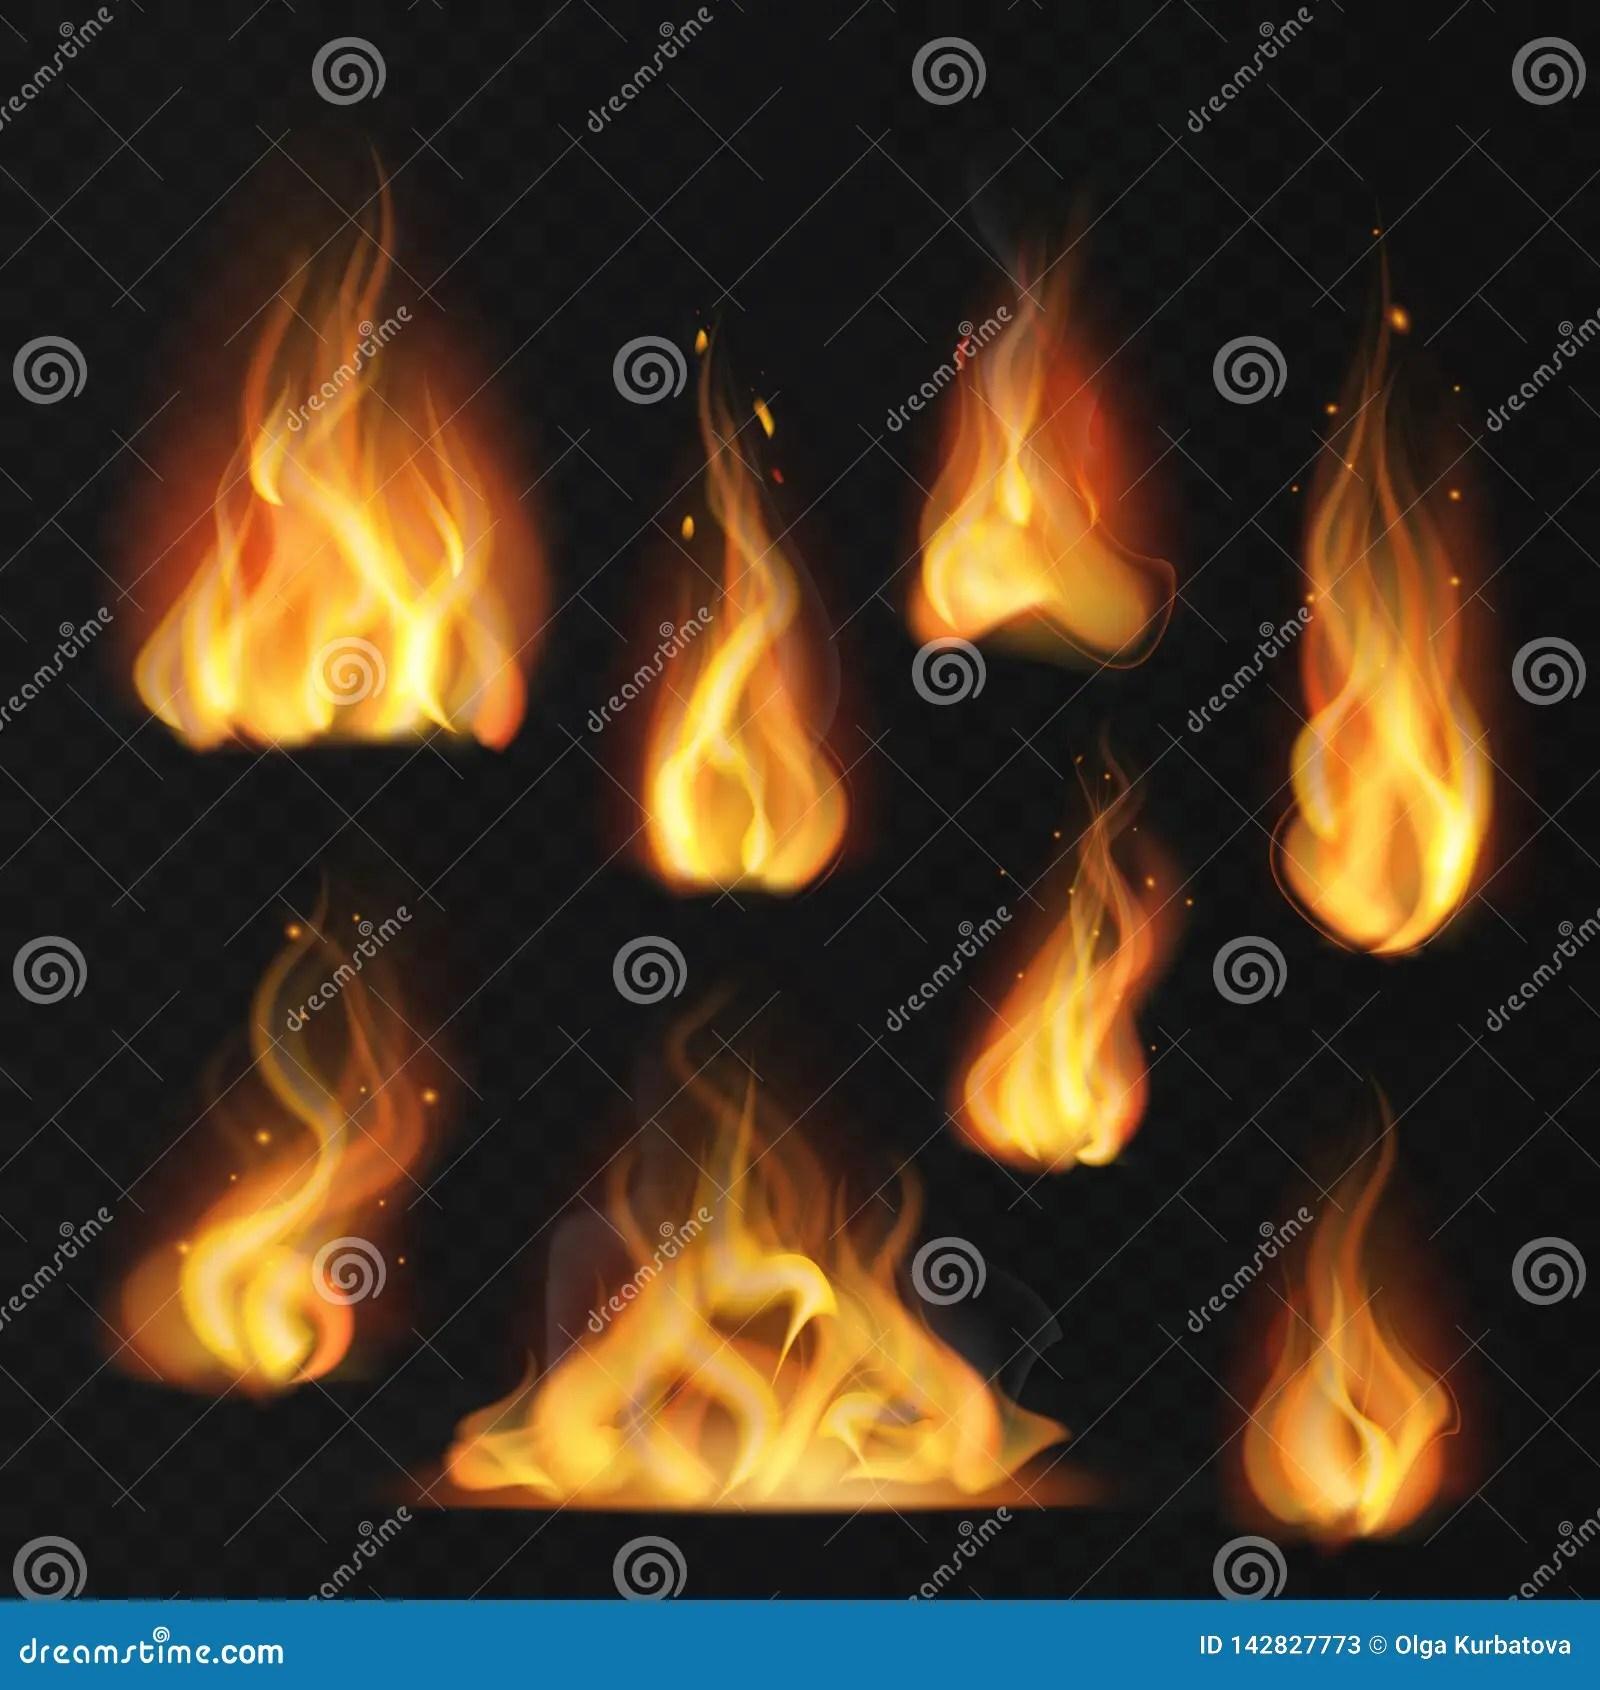 realistic flame fireball warm